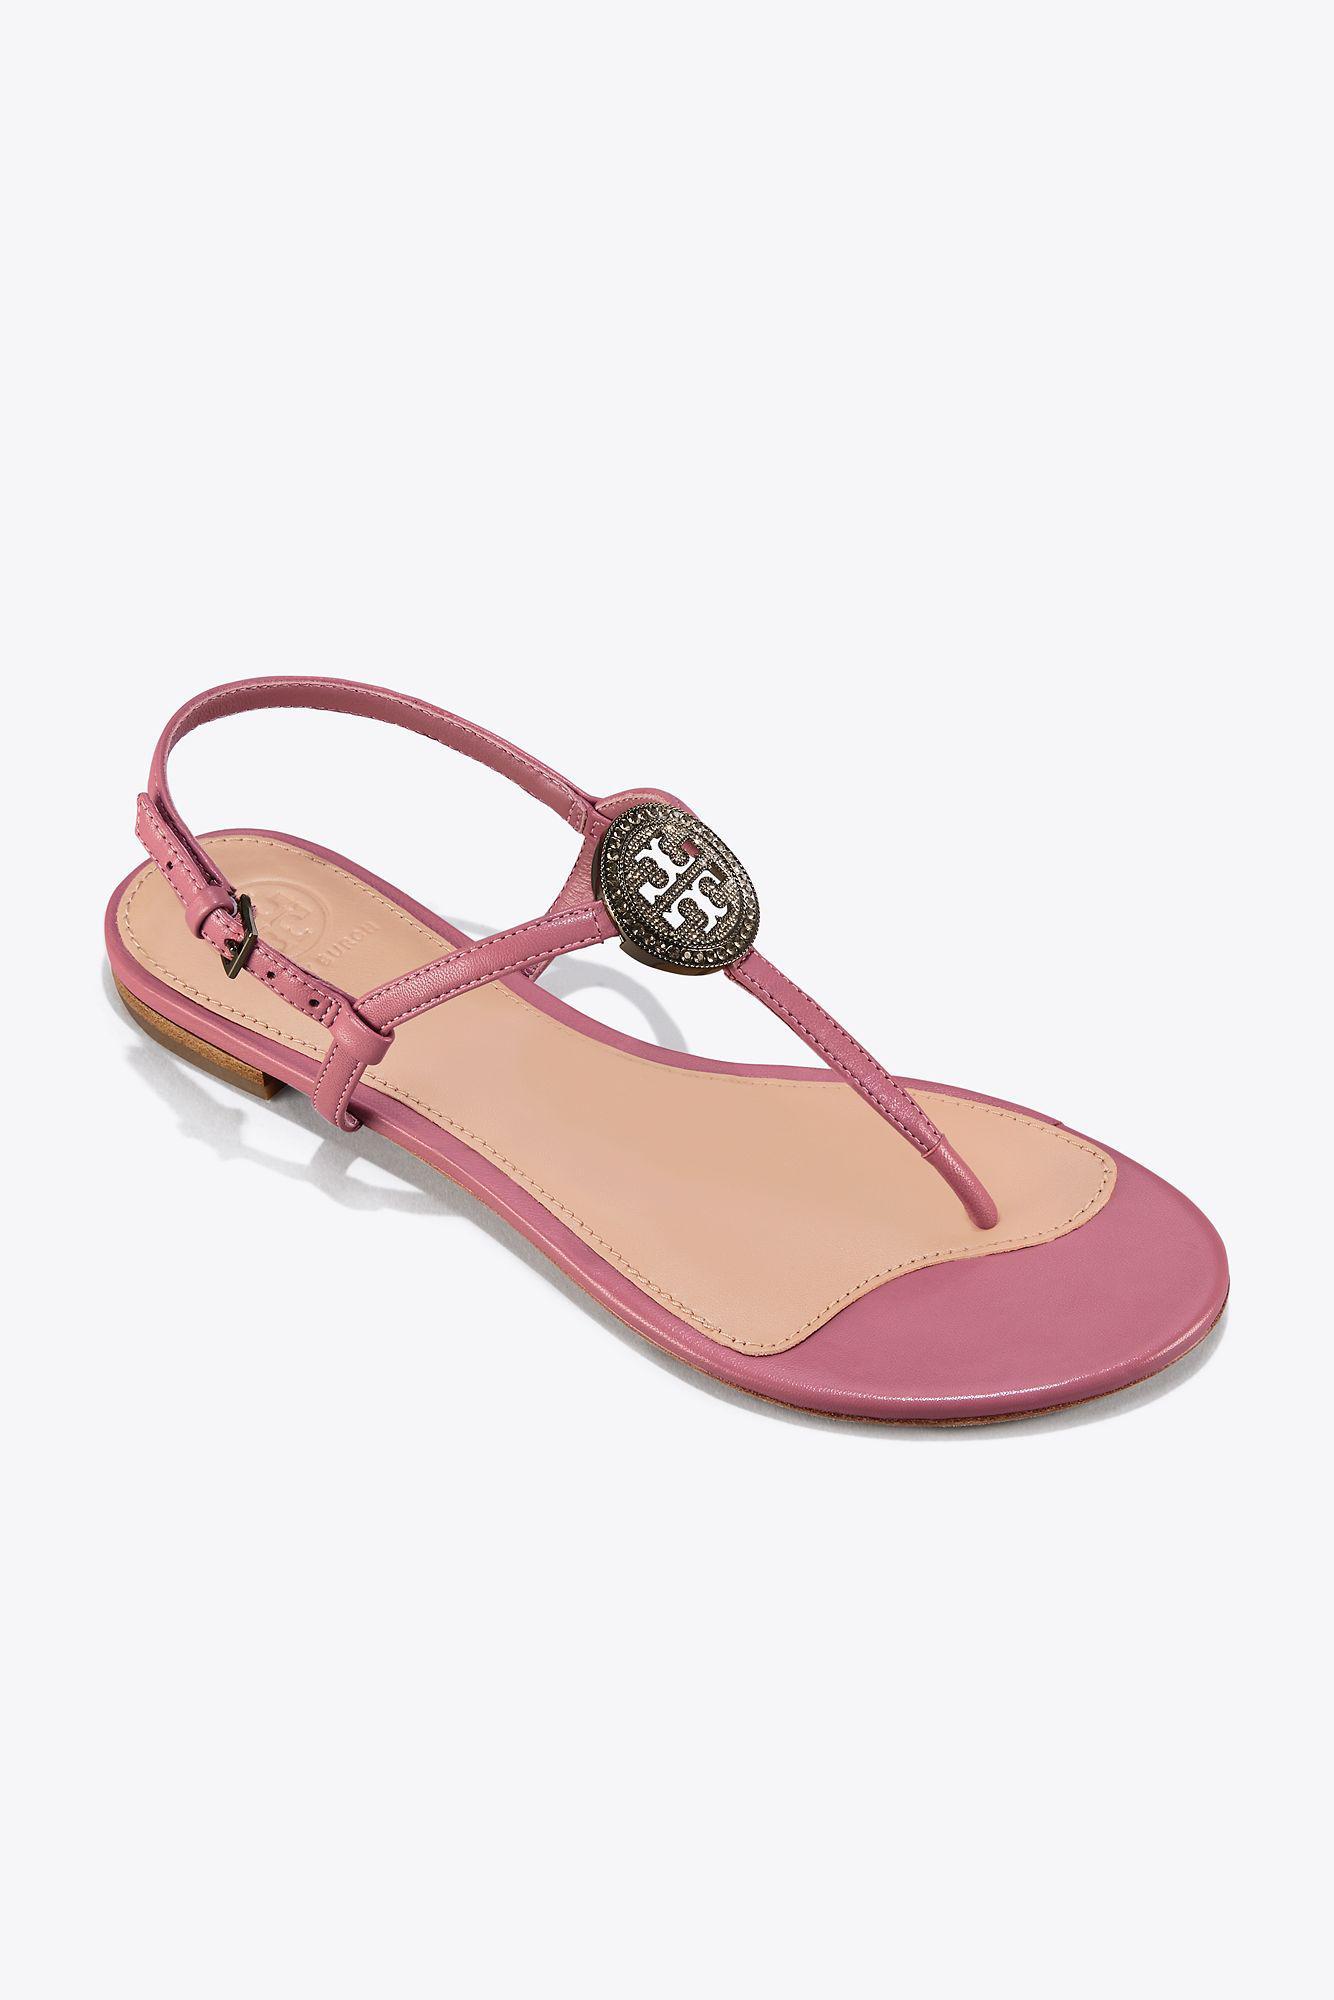 ea9f08b37e5 Lyst - Tory Burch Liana Flat Sandal in Pink